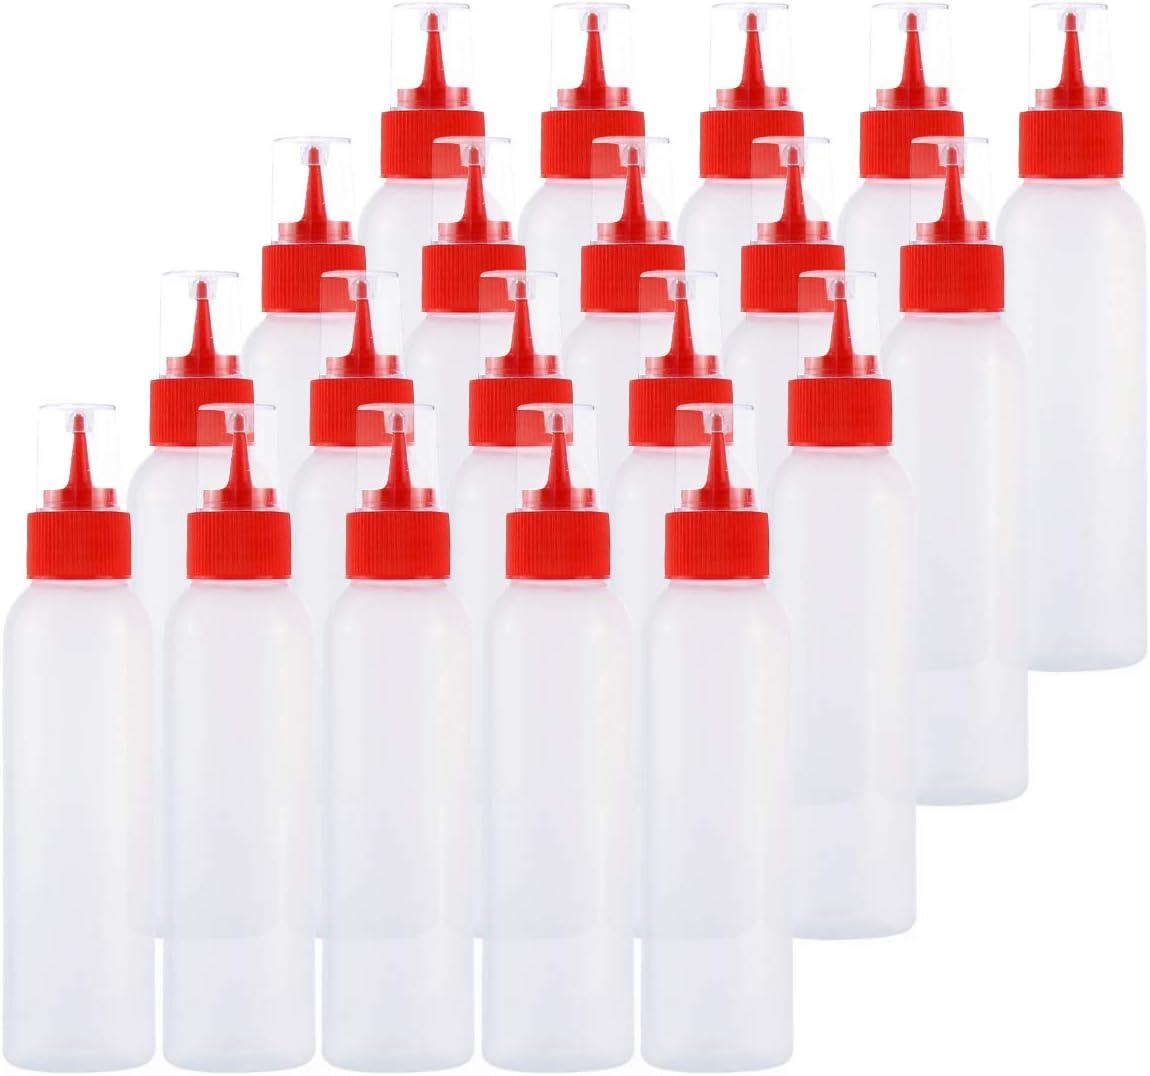 Kingrol 30-Pack Easy Squeeze Writer Bottles, 4 Ounces Soft Applicator Bottle for Paint, Glue, Glaze, DIY Craft, Art - Red